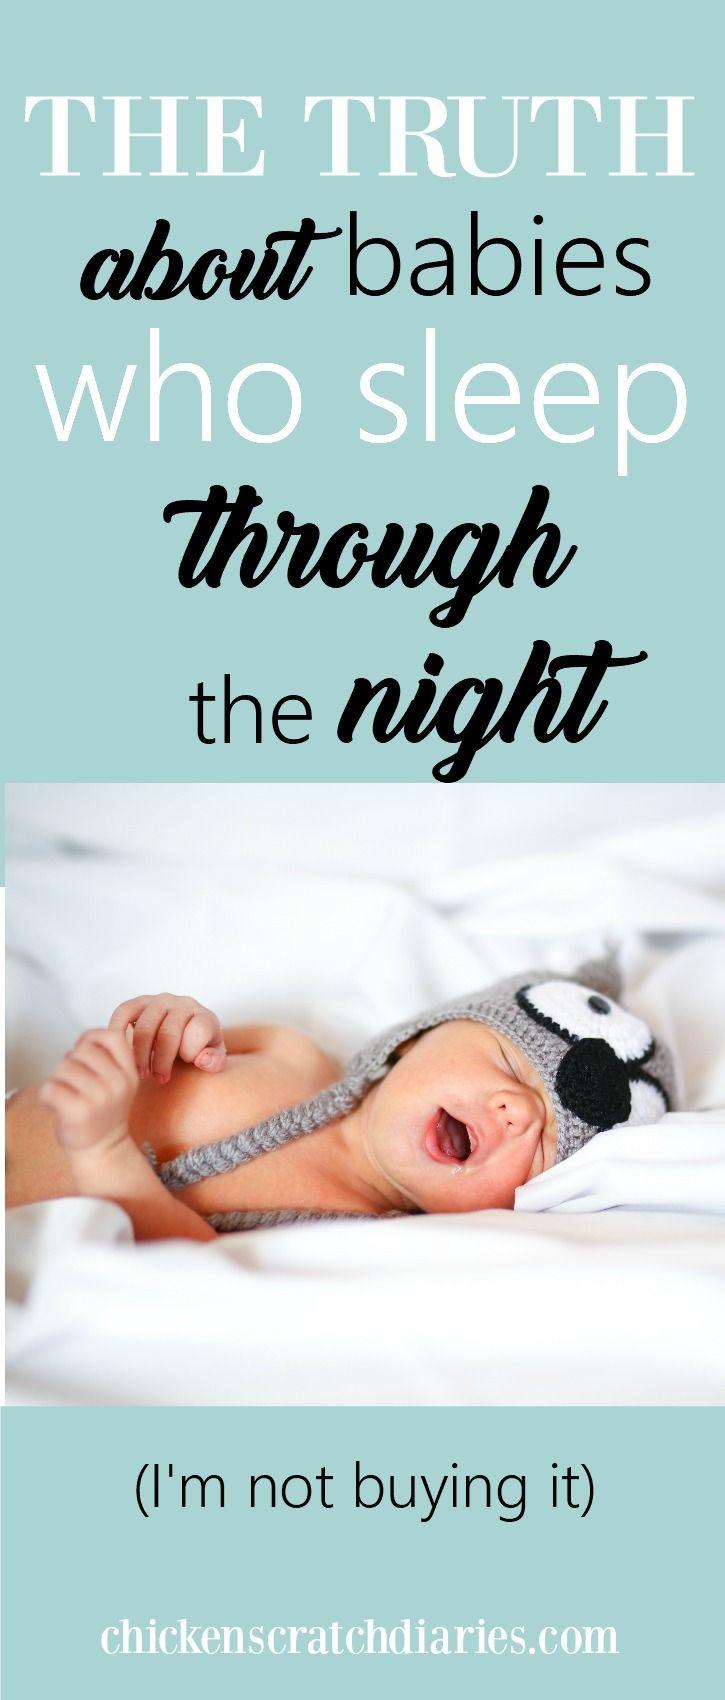 Lol! The real story behind the peacefully-sleeping-babies phenomenon. #MomHumor #babies #momlife